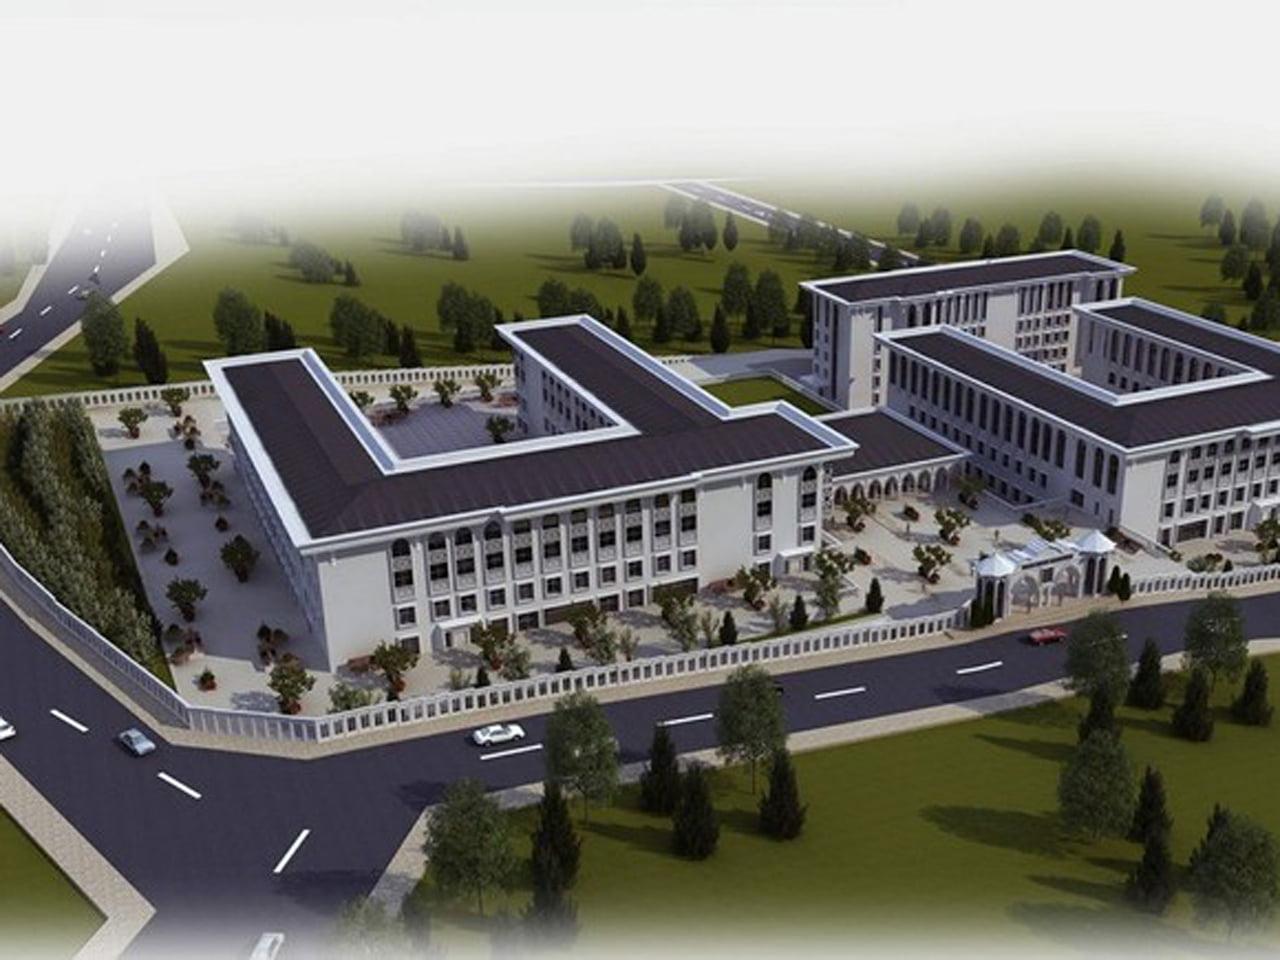 Emin Saraç Anadolu İmam Hatip Lisesi